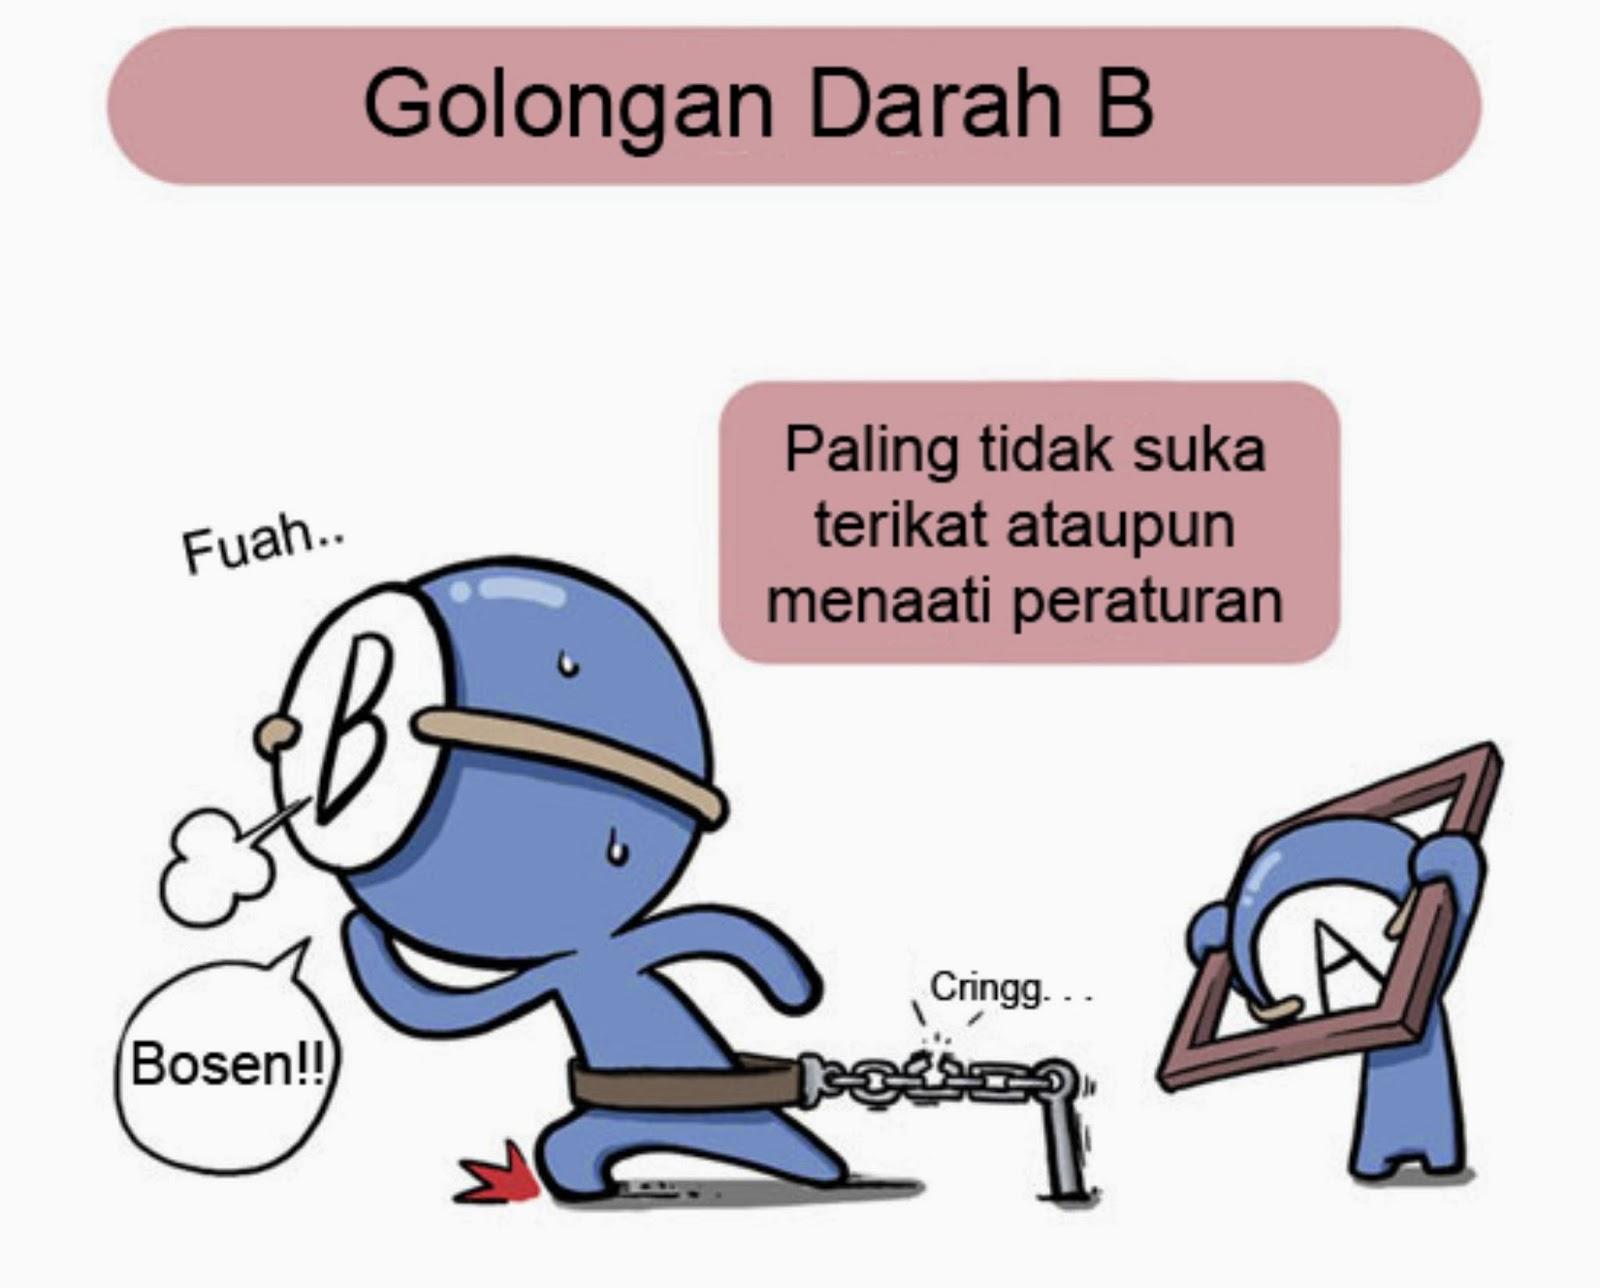 Komik Golongan Darah Terbaru